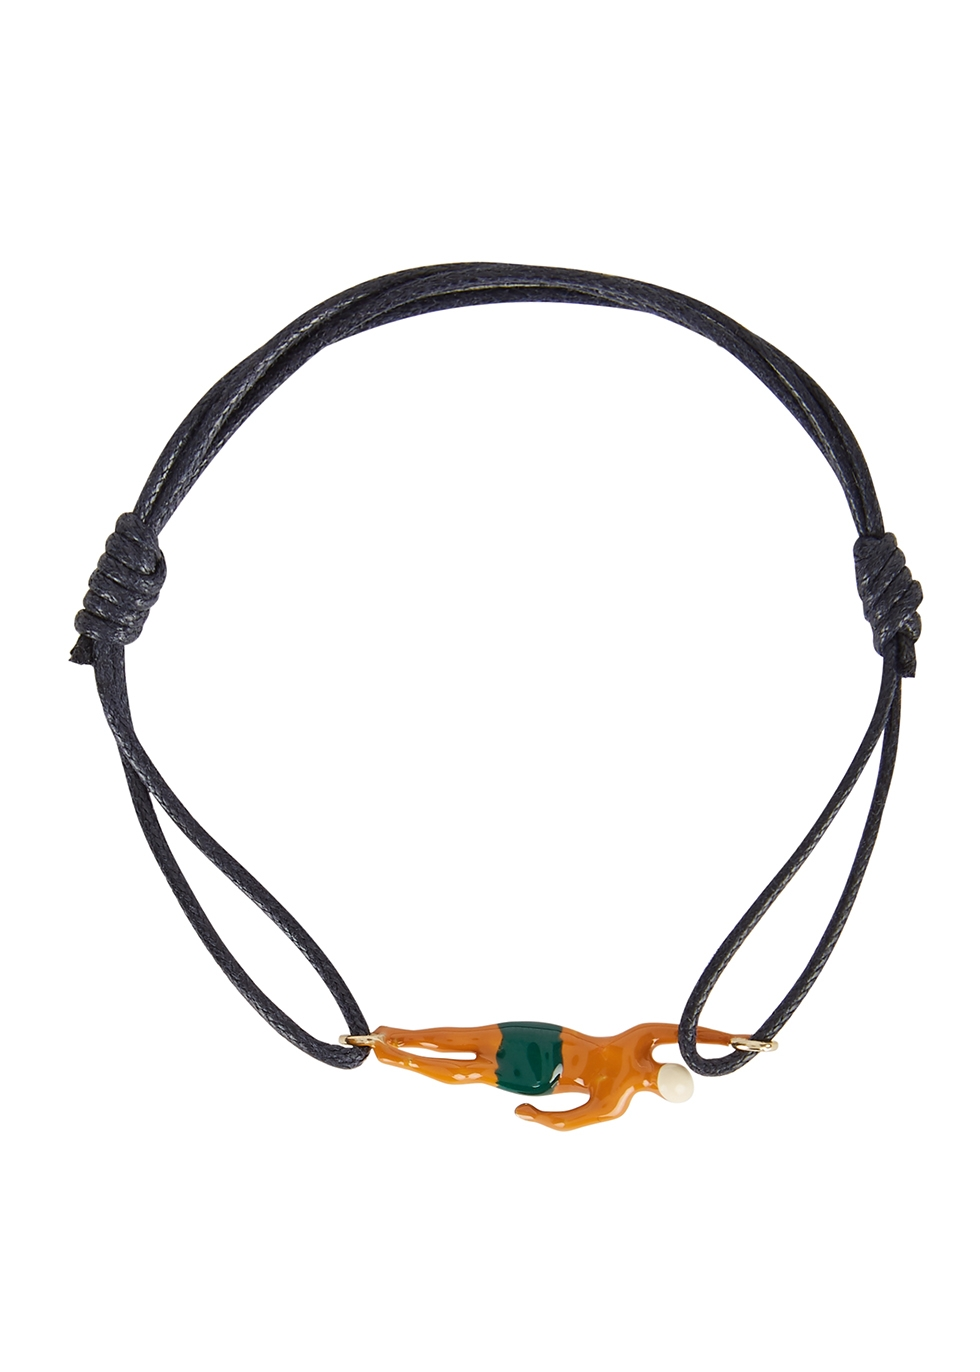 Nadador navy cord bracelet